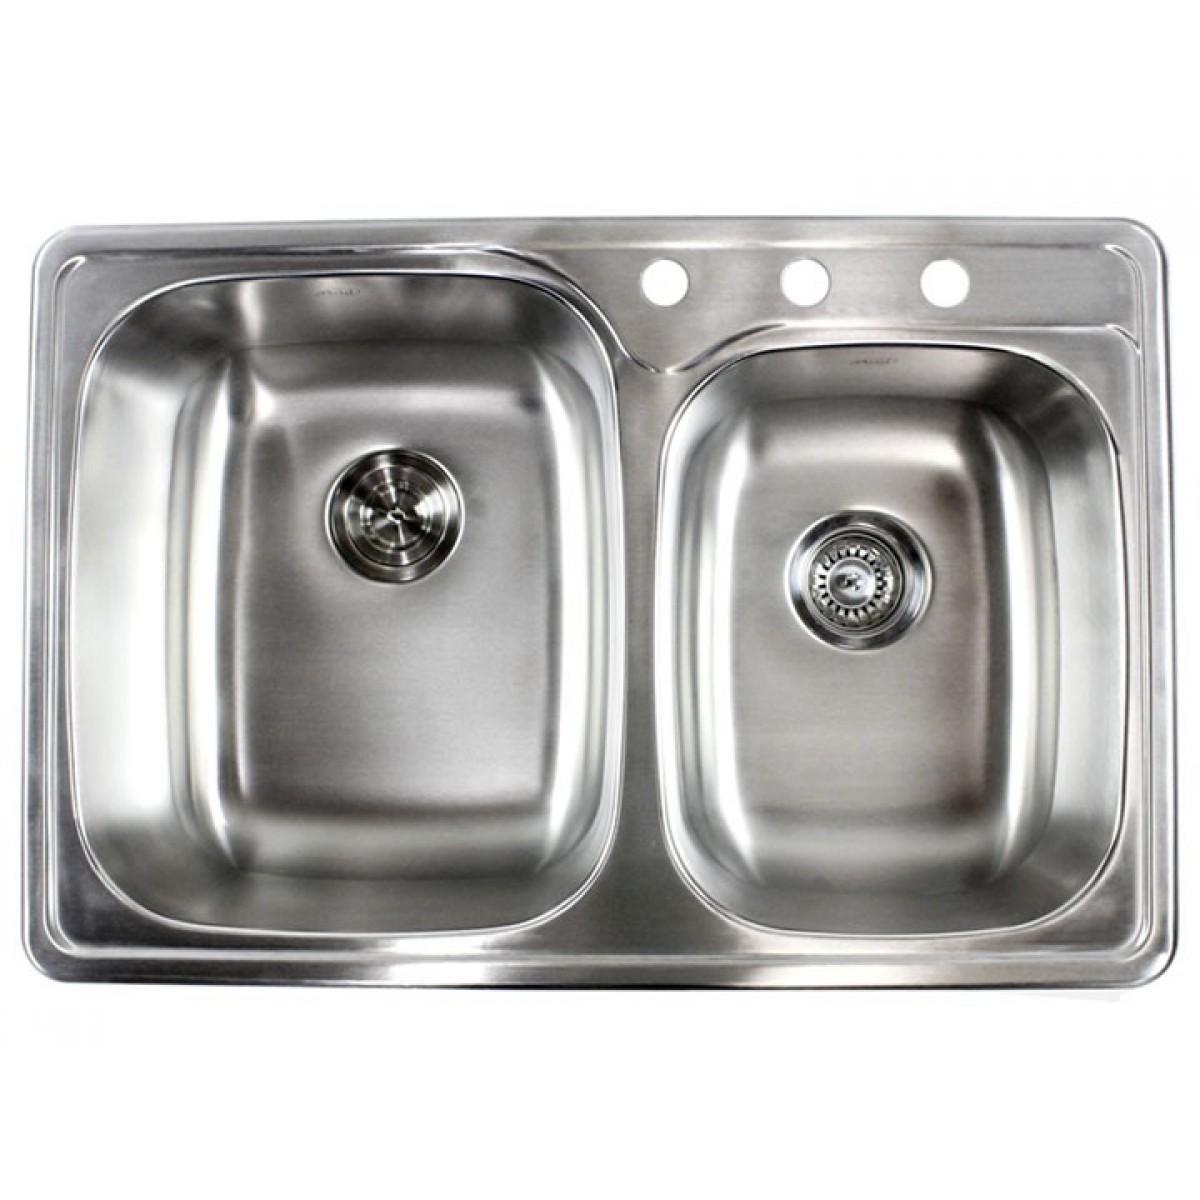 33 Inch Stainless Steel Top Mount Drop In 60/40 Double Bowl Kitchen Sink    18 Gauge